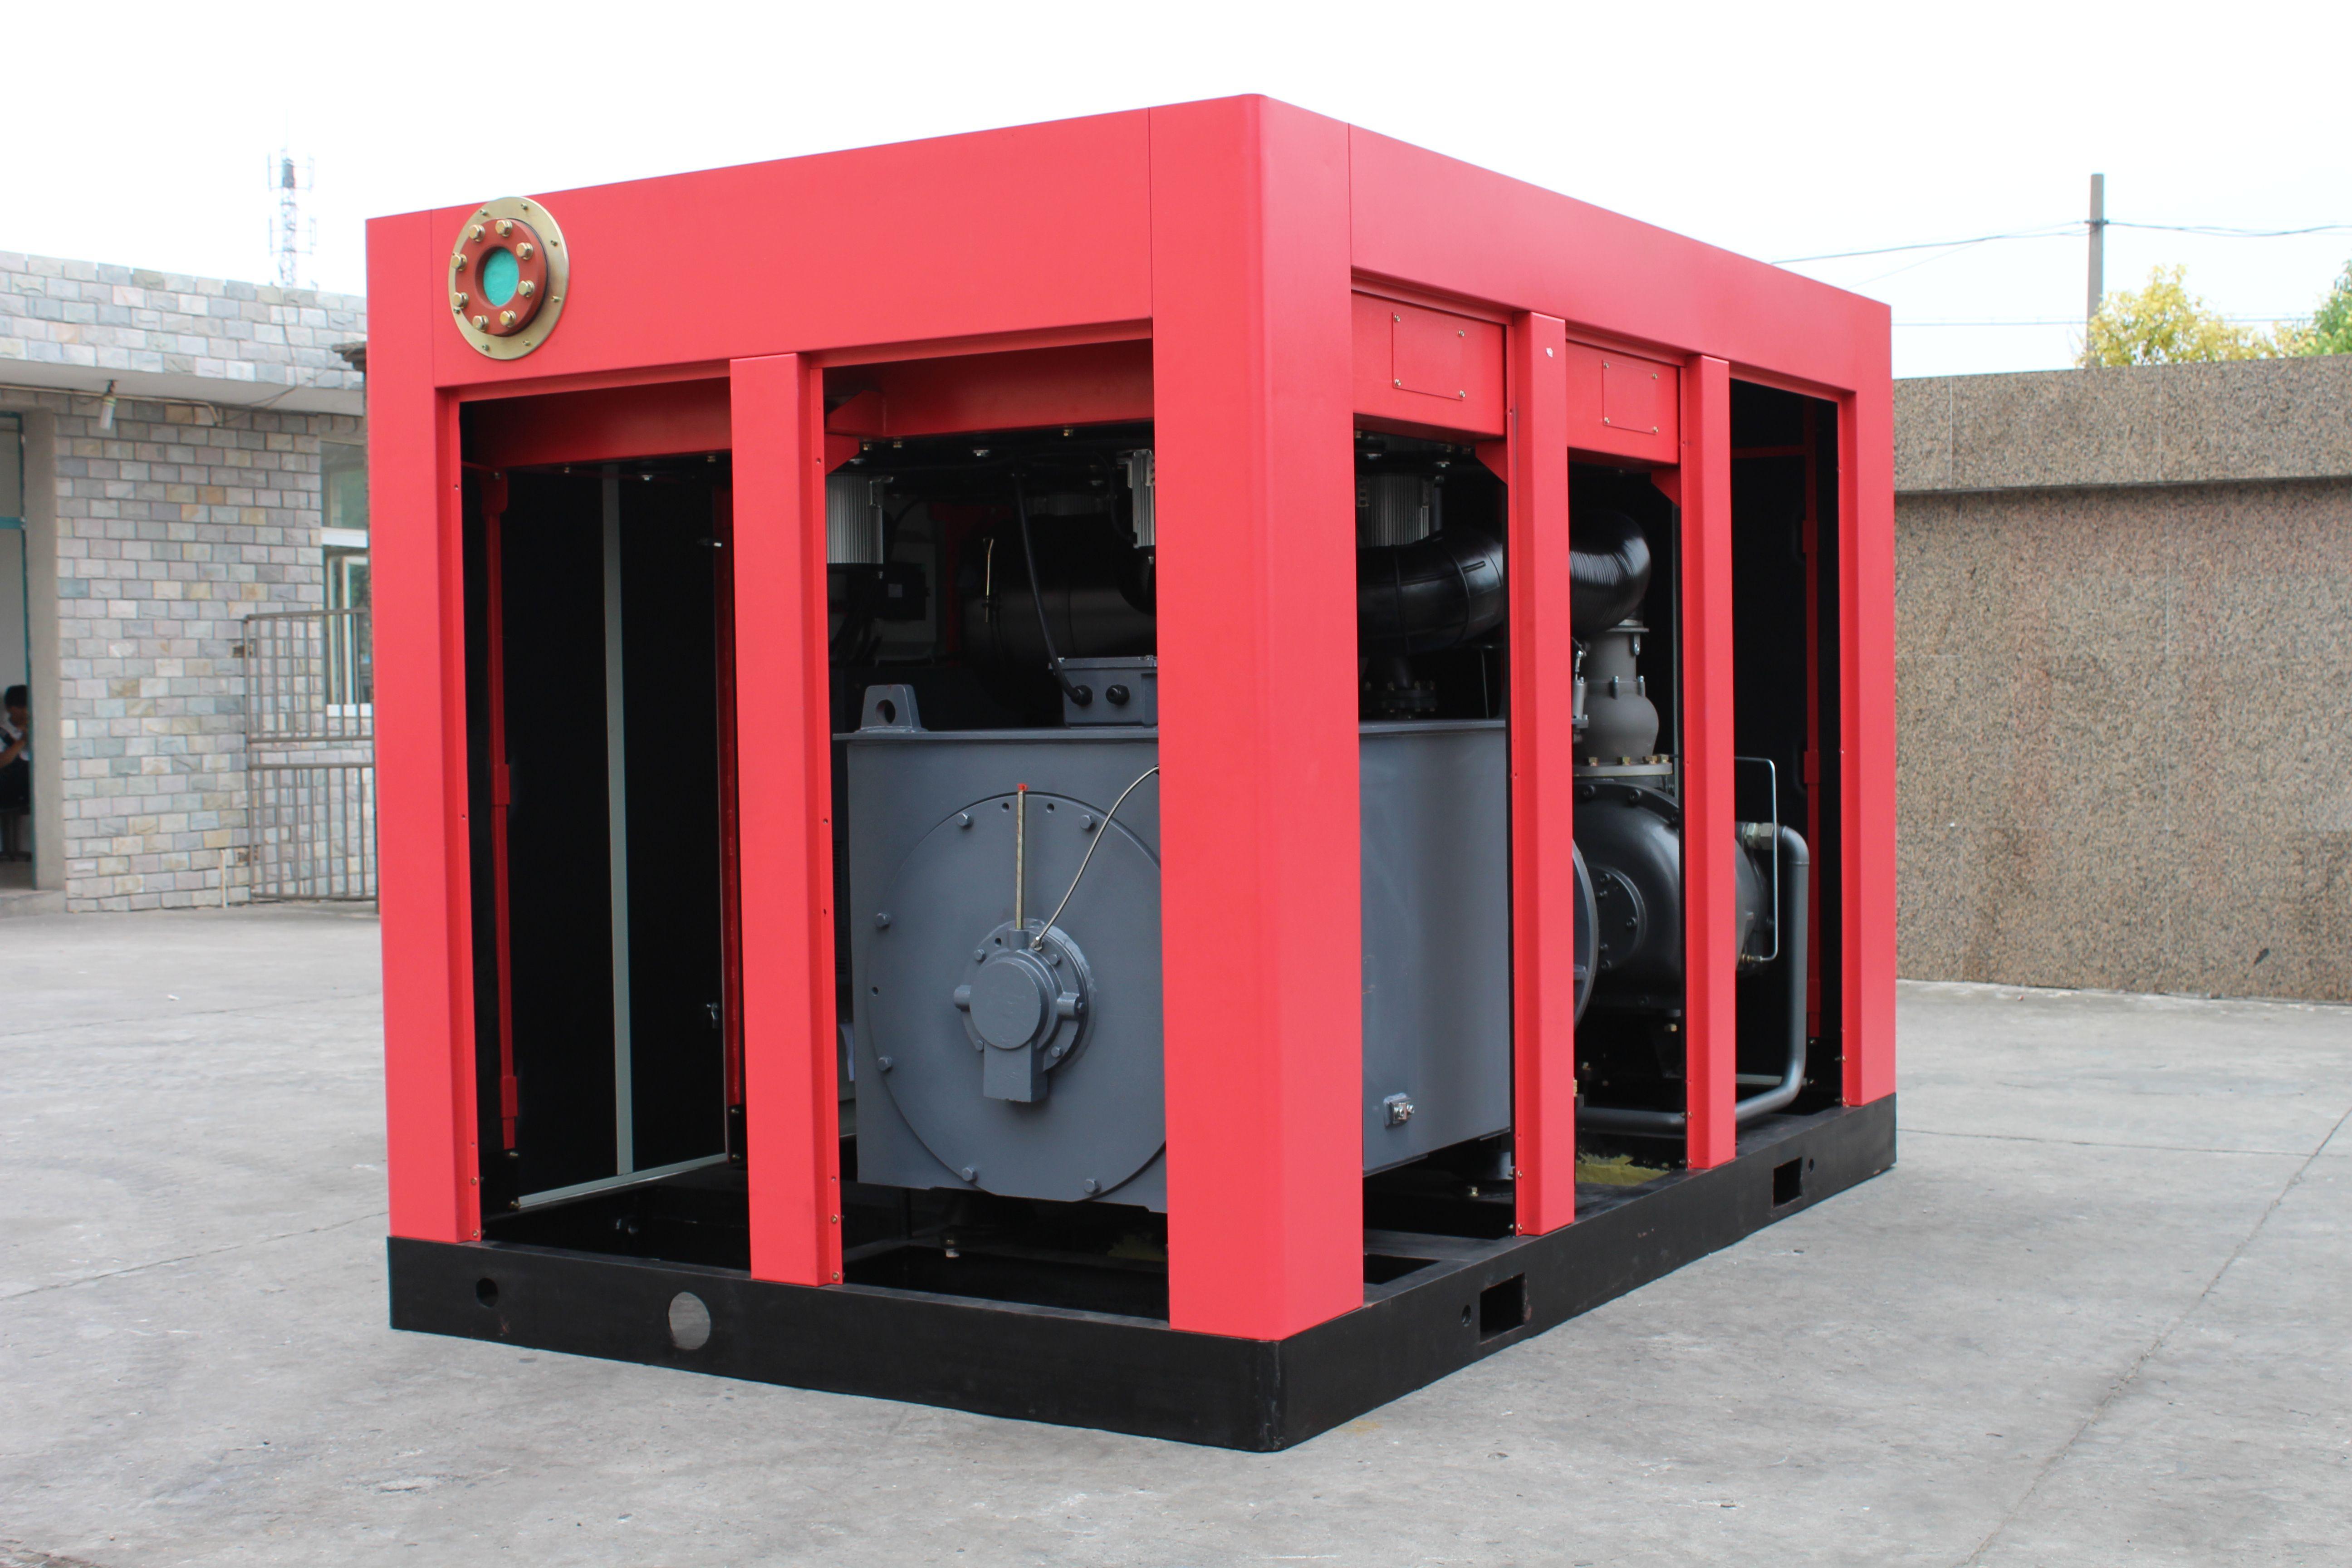 Ozone Generator 49 Ozone generator, Air purifier, Ozone